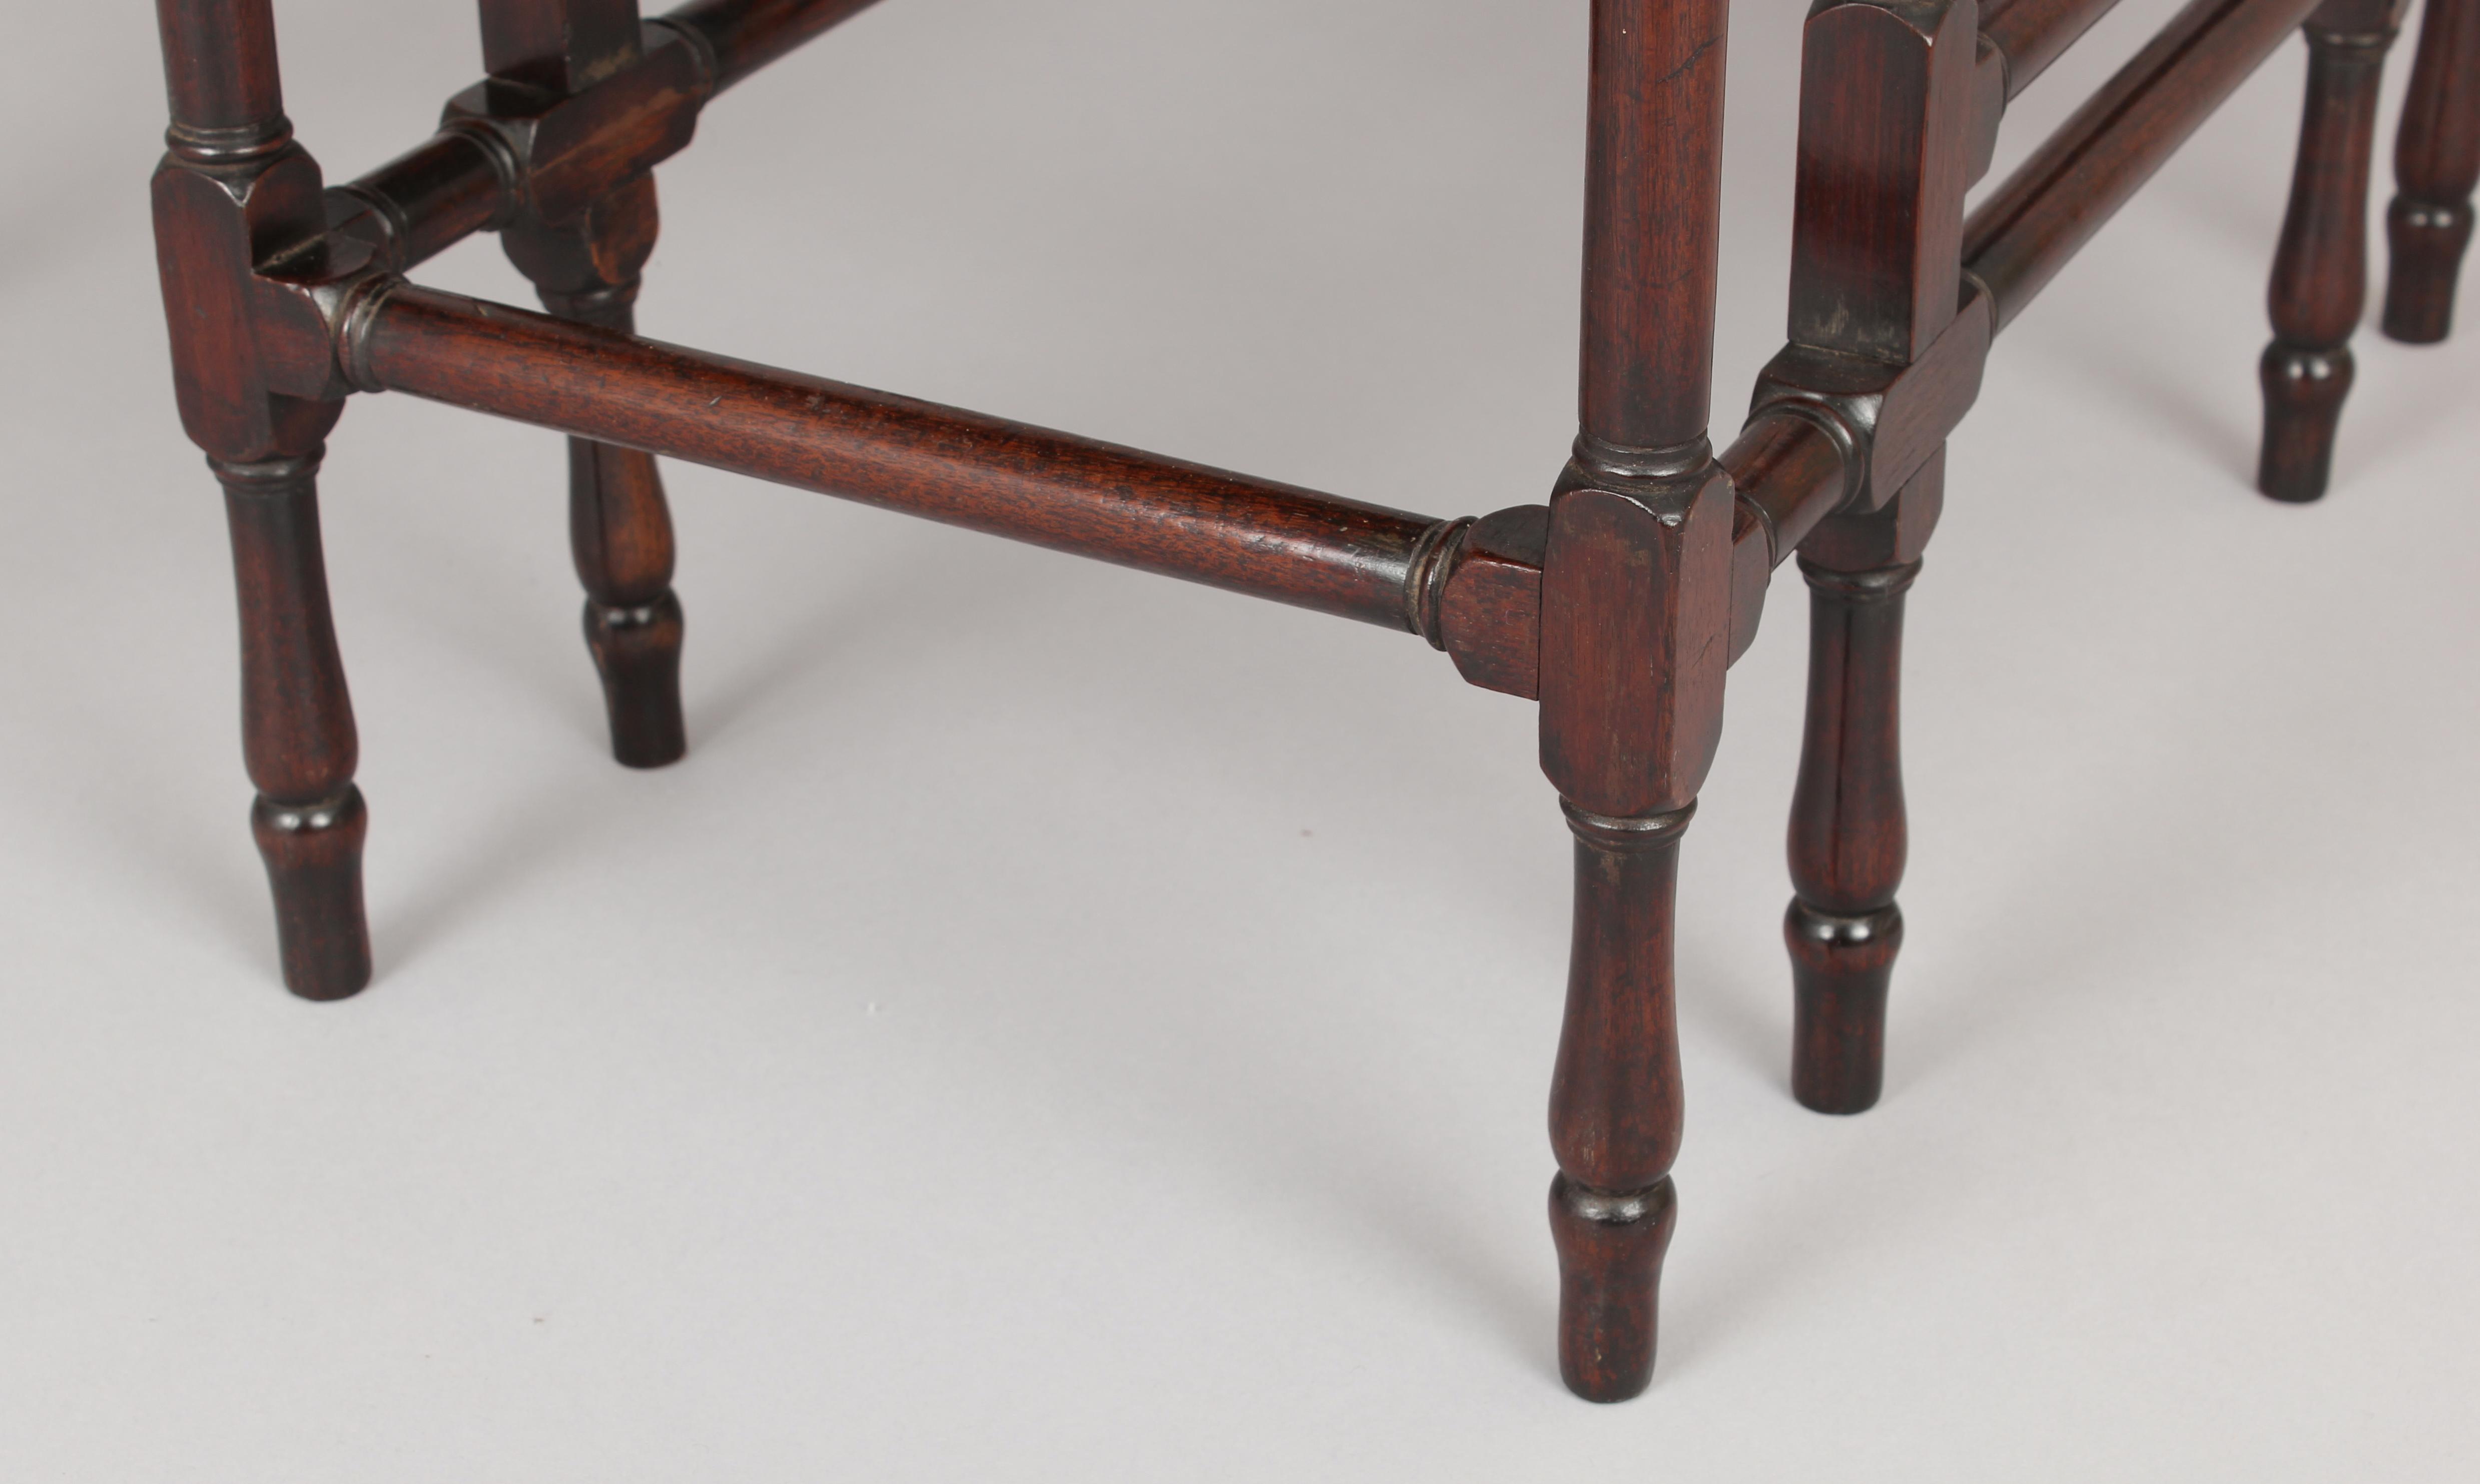 Fine George III Period Mahogany Spider-Leg Drop-Leaf Table